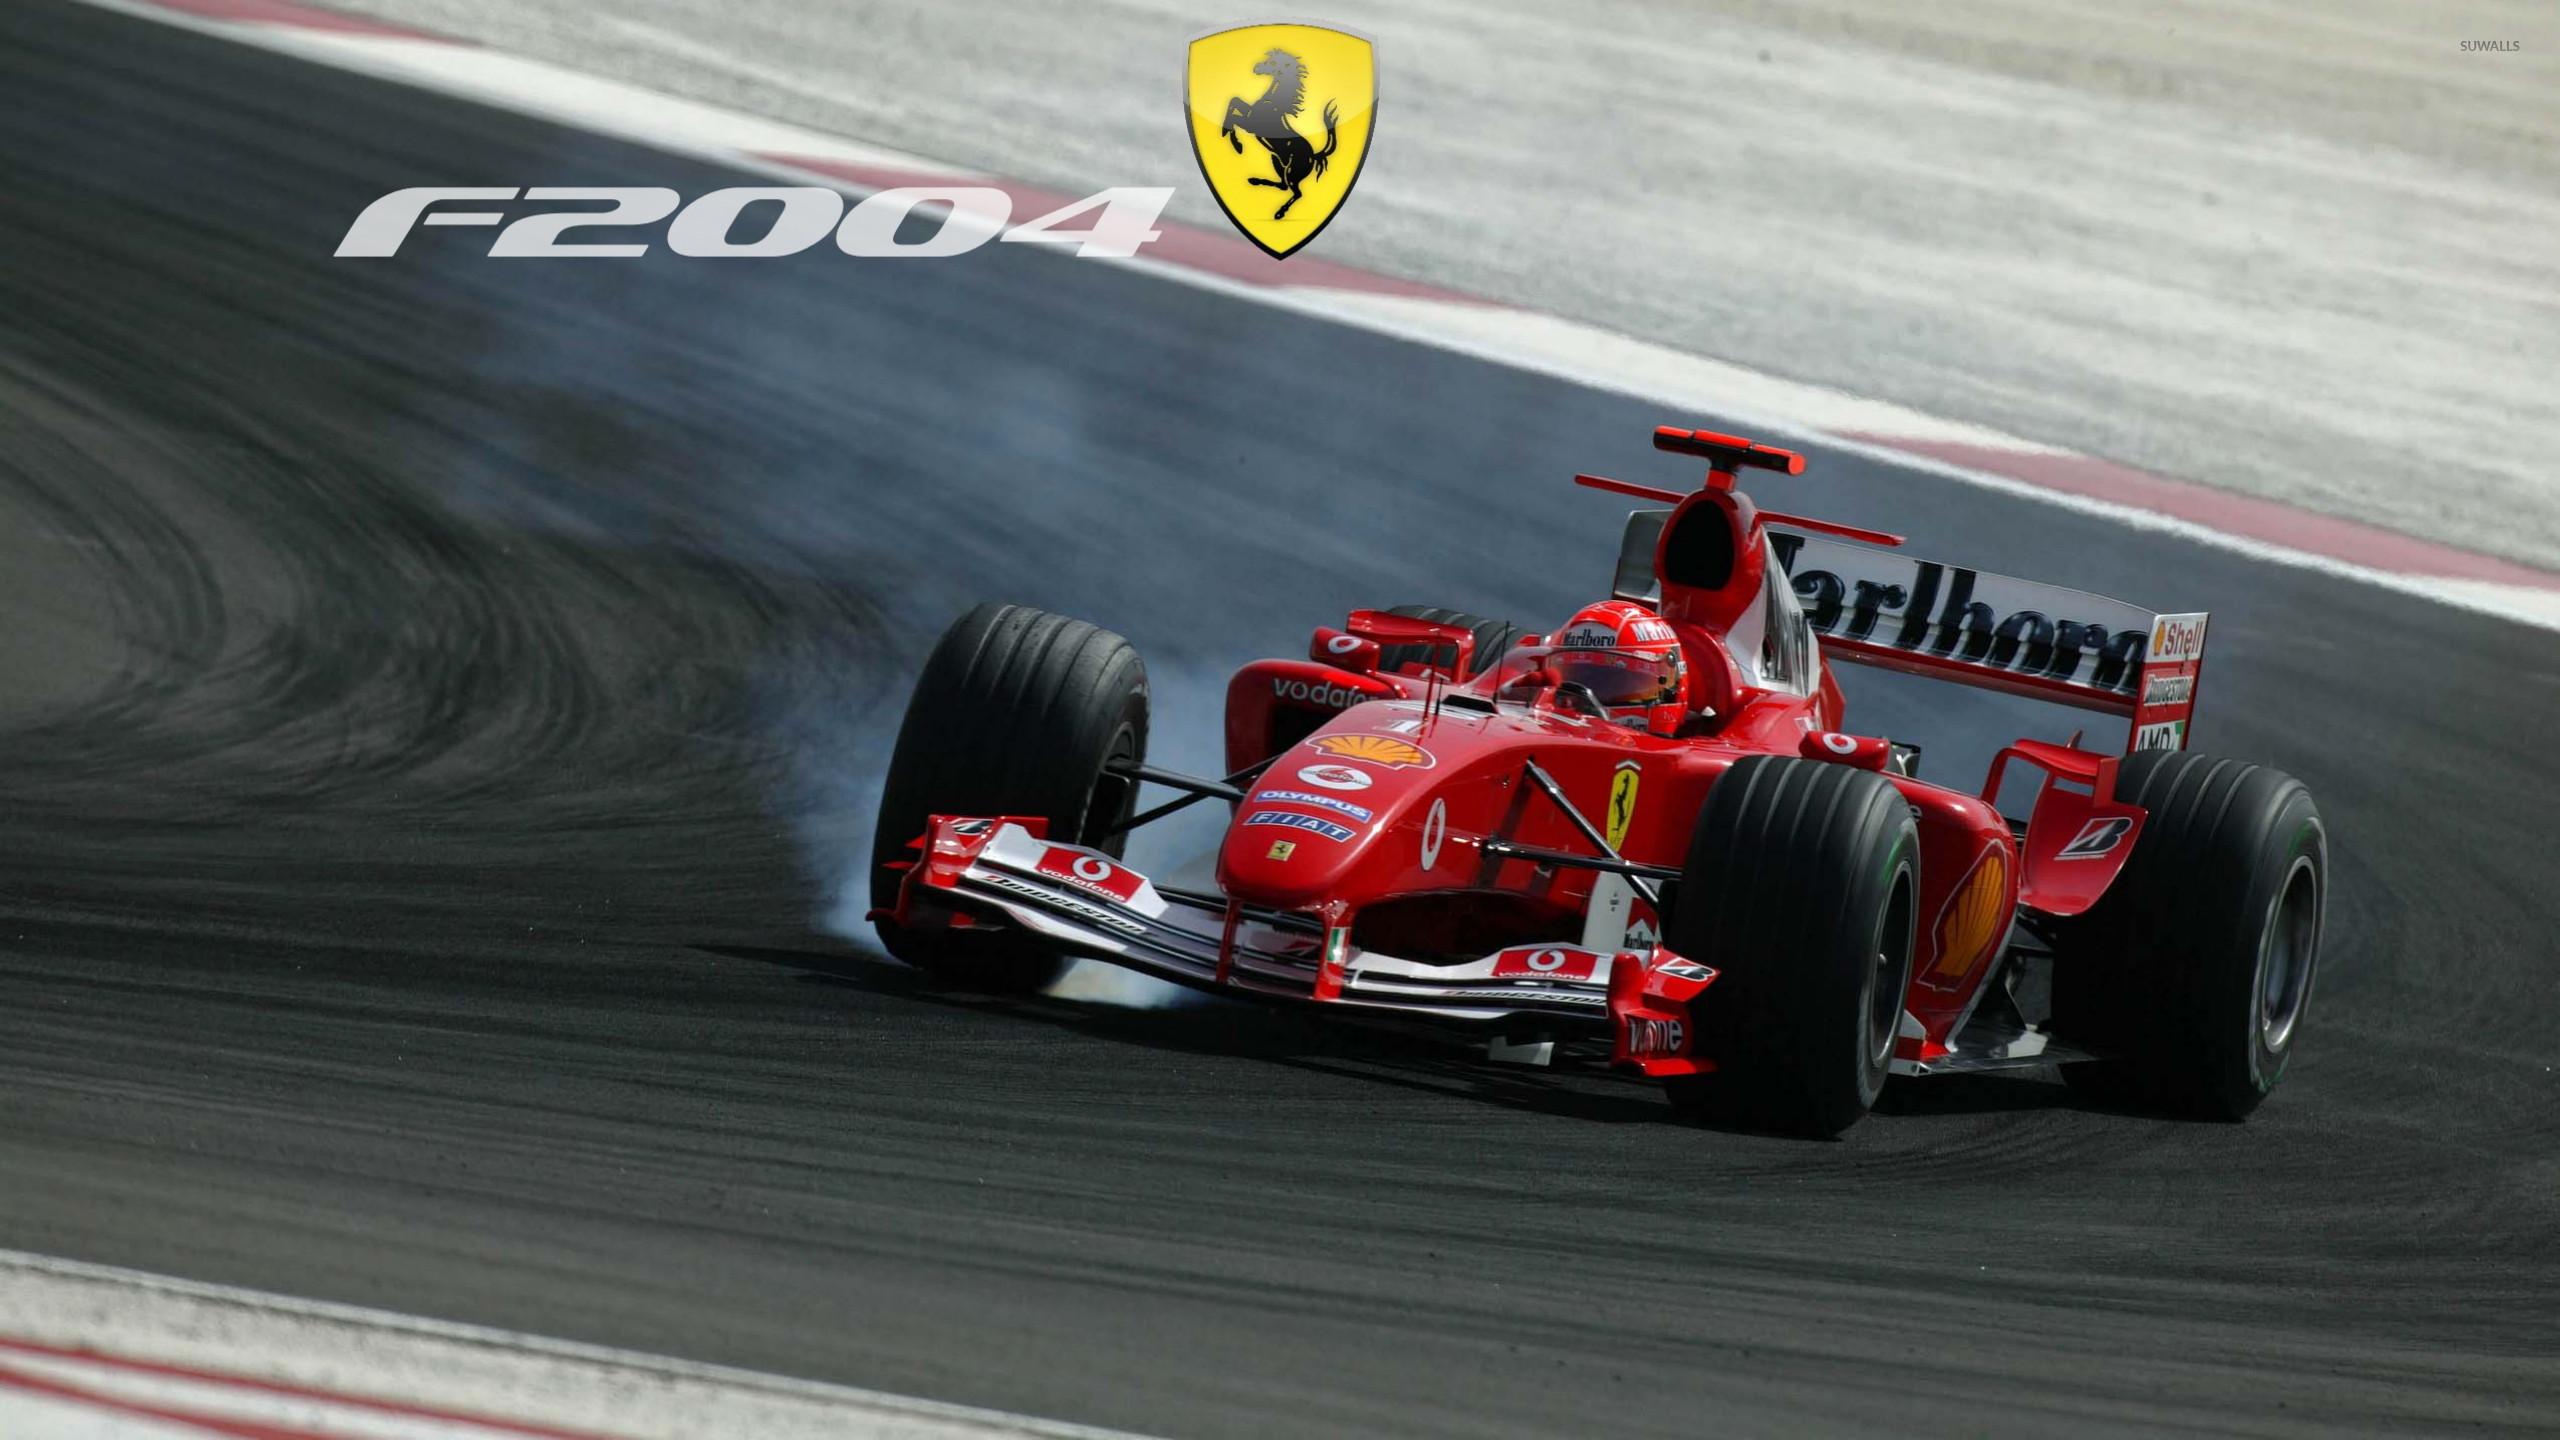 Ferrari F2004 Wallpaper Sport Wallpapers 30543